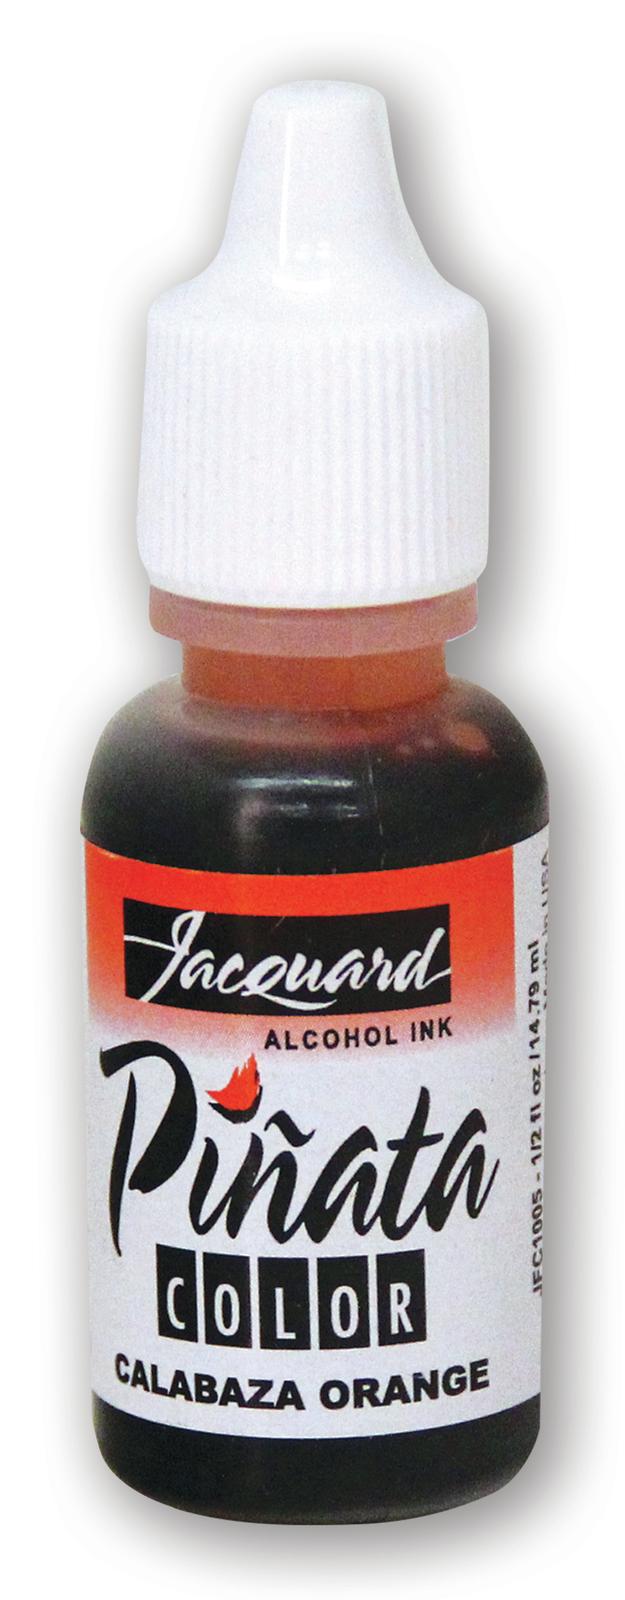 Jacquard: Pinata Colour Exciter Pack (9 x 14ml Bottles) image